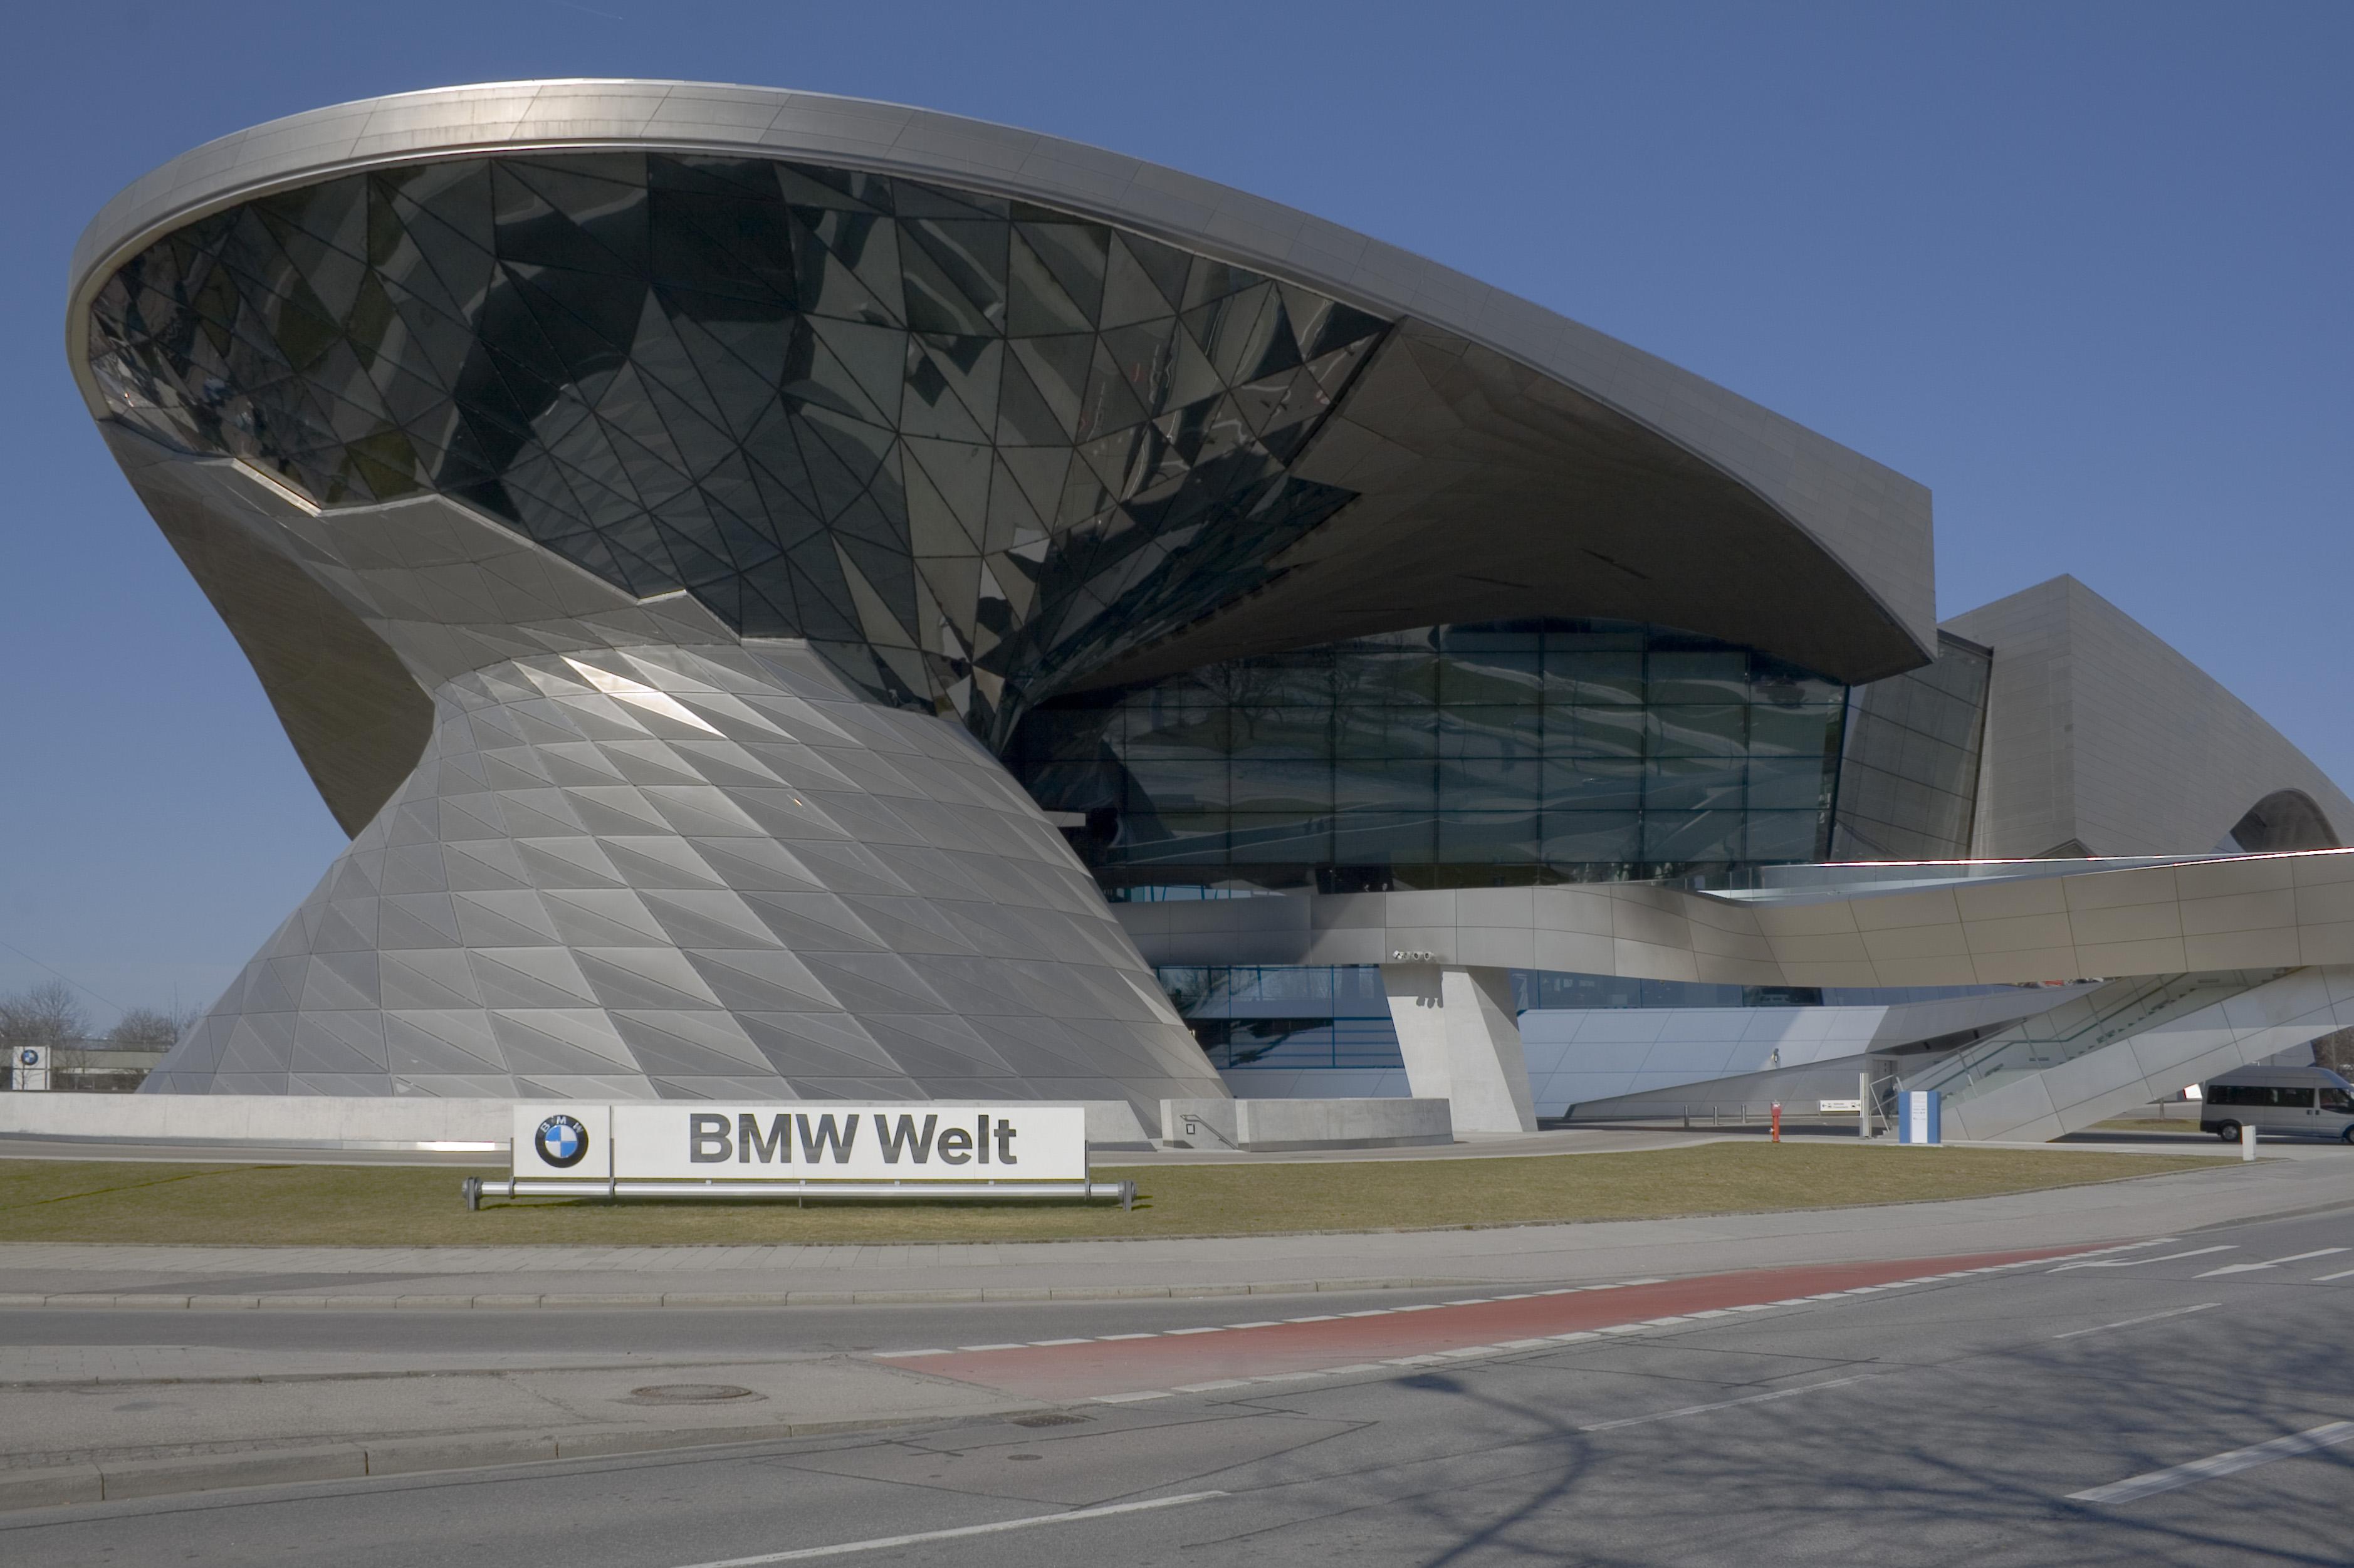 File:BMW Welt, Múnich, Alemania01.JPG - Wikimedia Commons